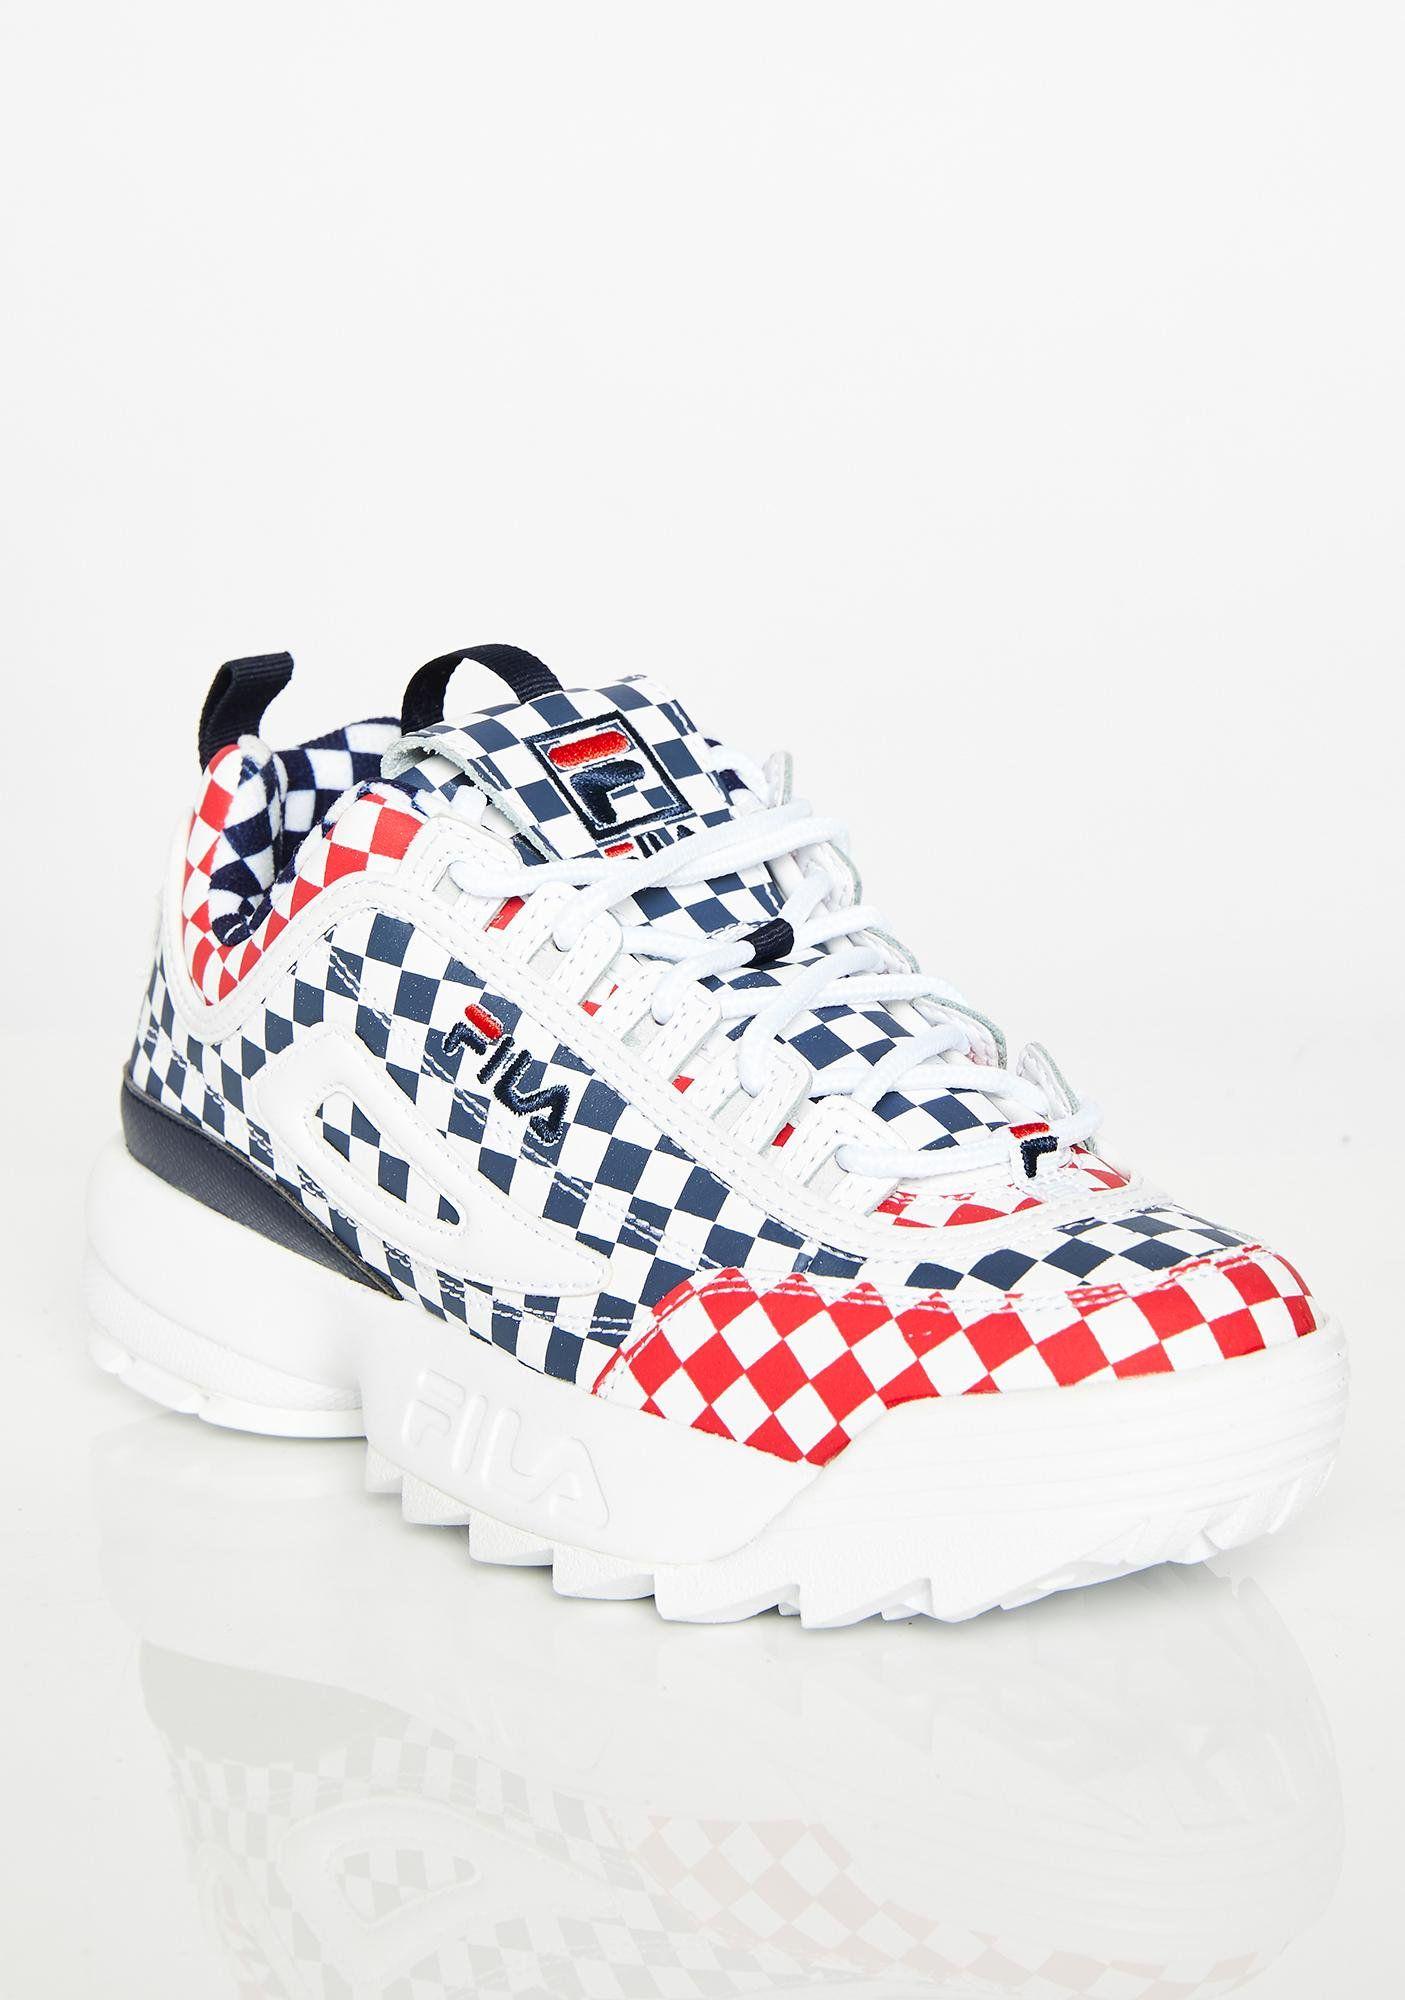 Royal Disruptor II Checkered Sneakers